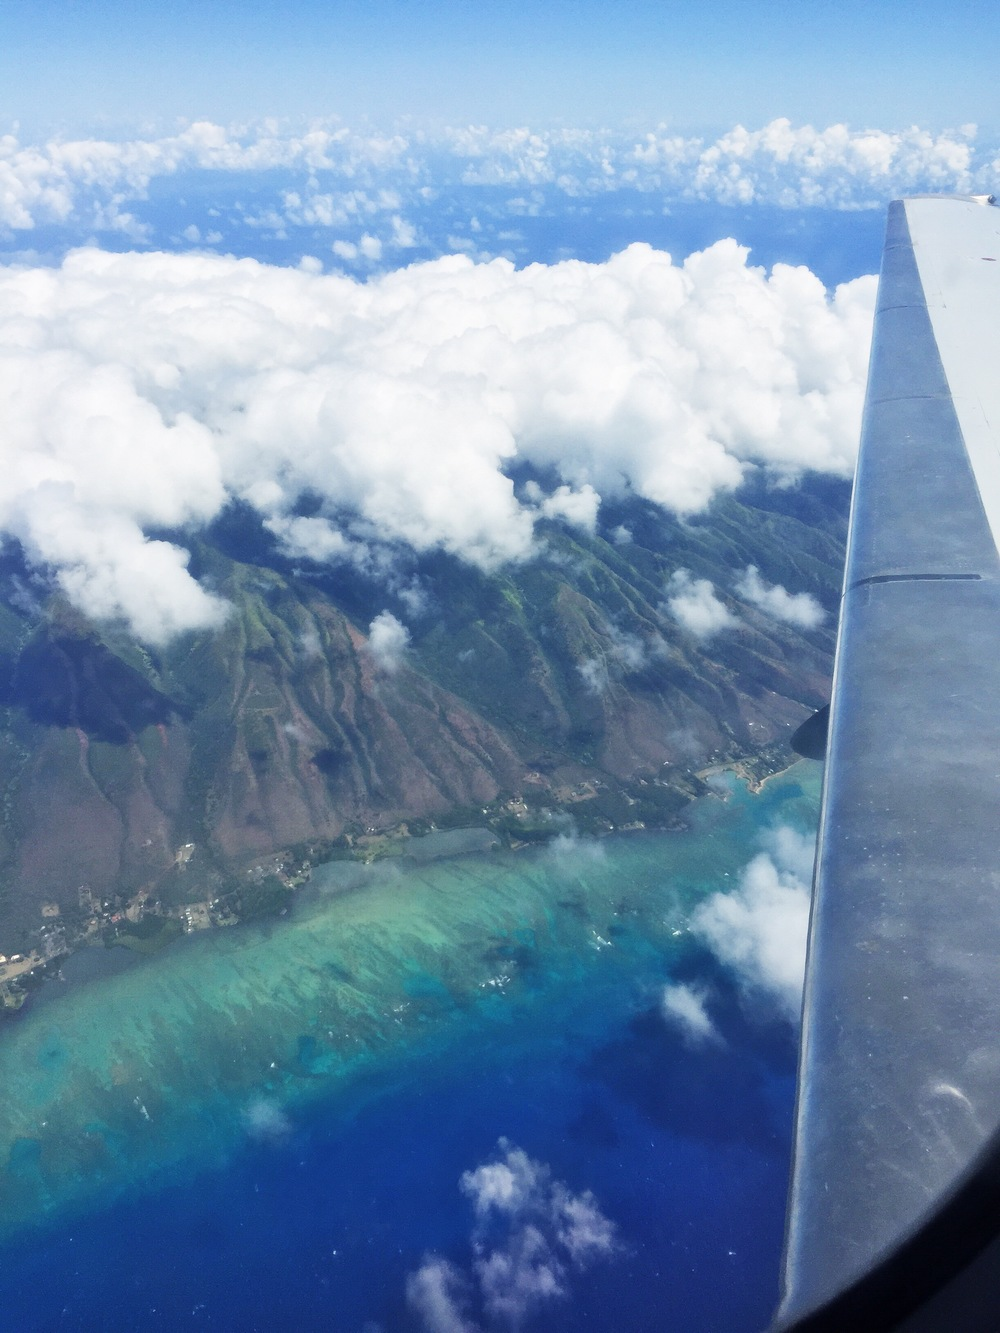 Hawaiian Airline from Maui to Oahu